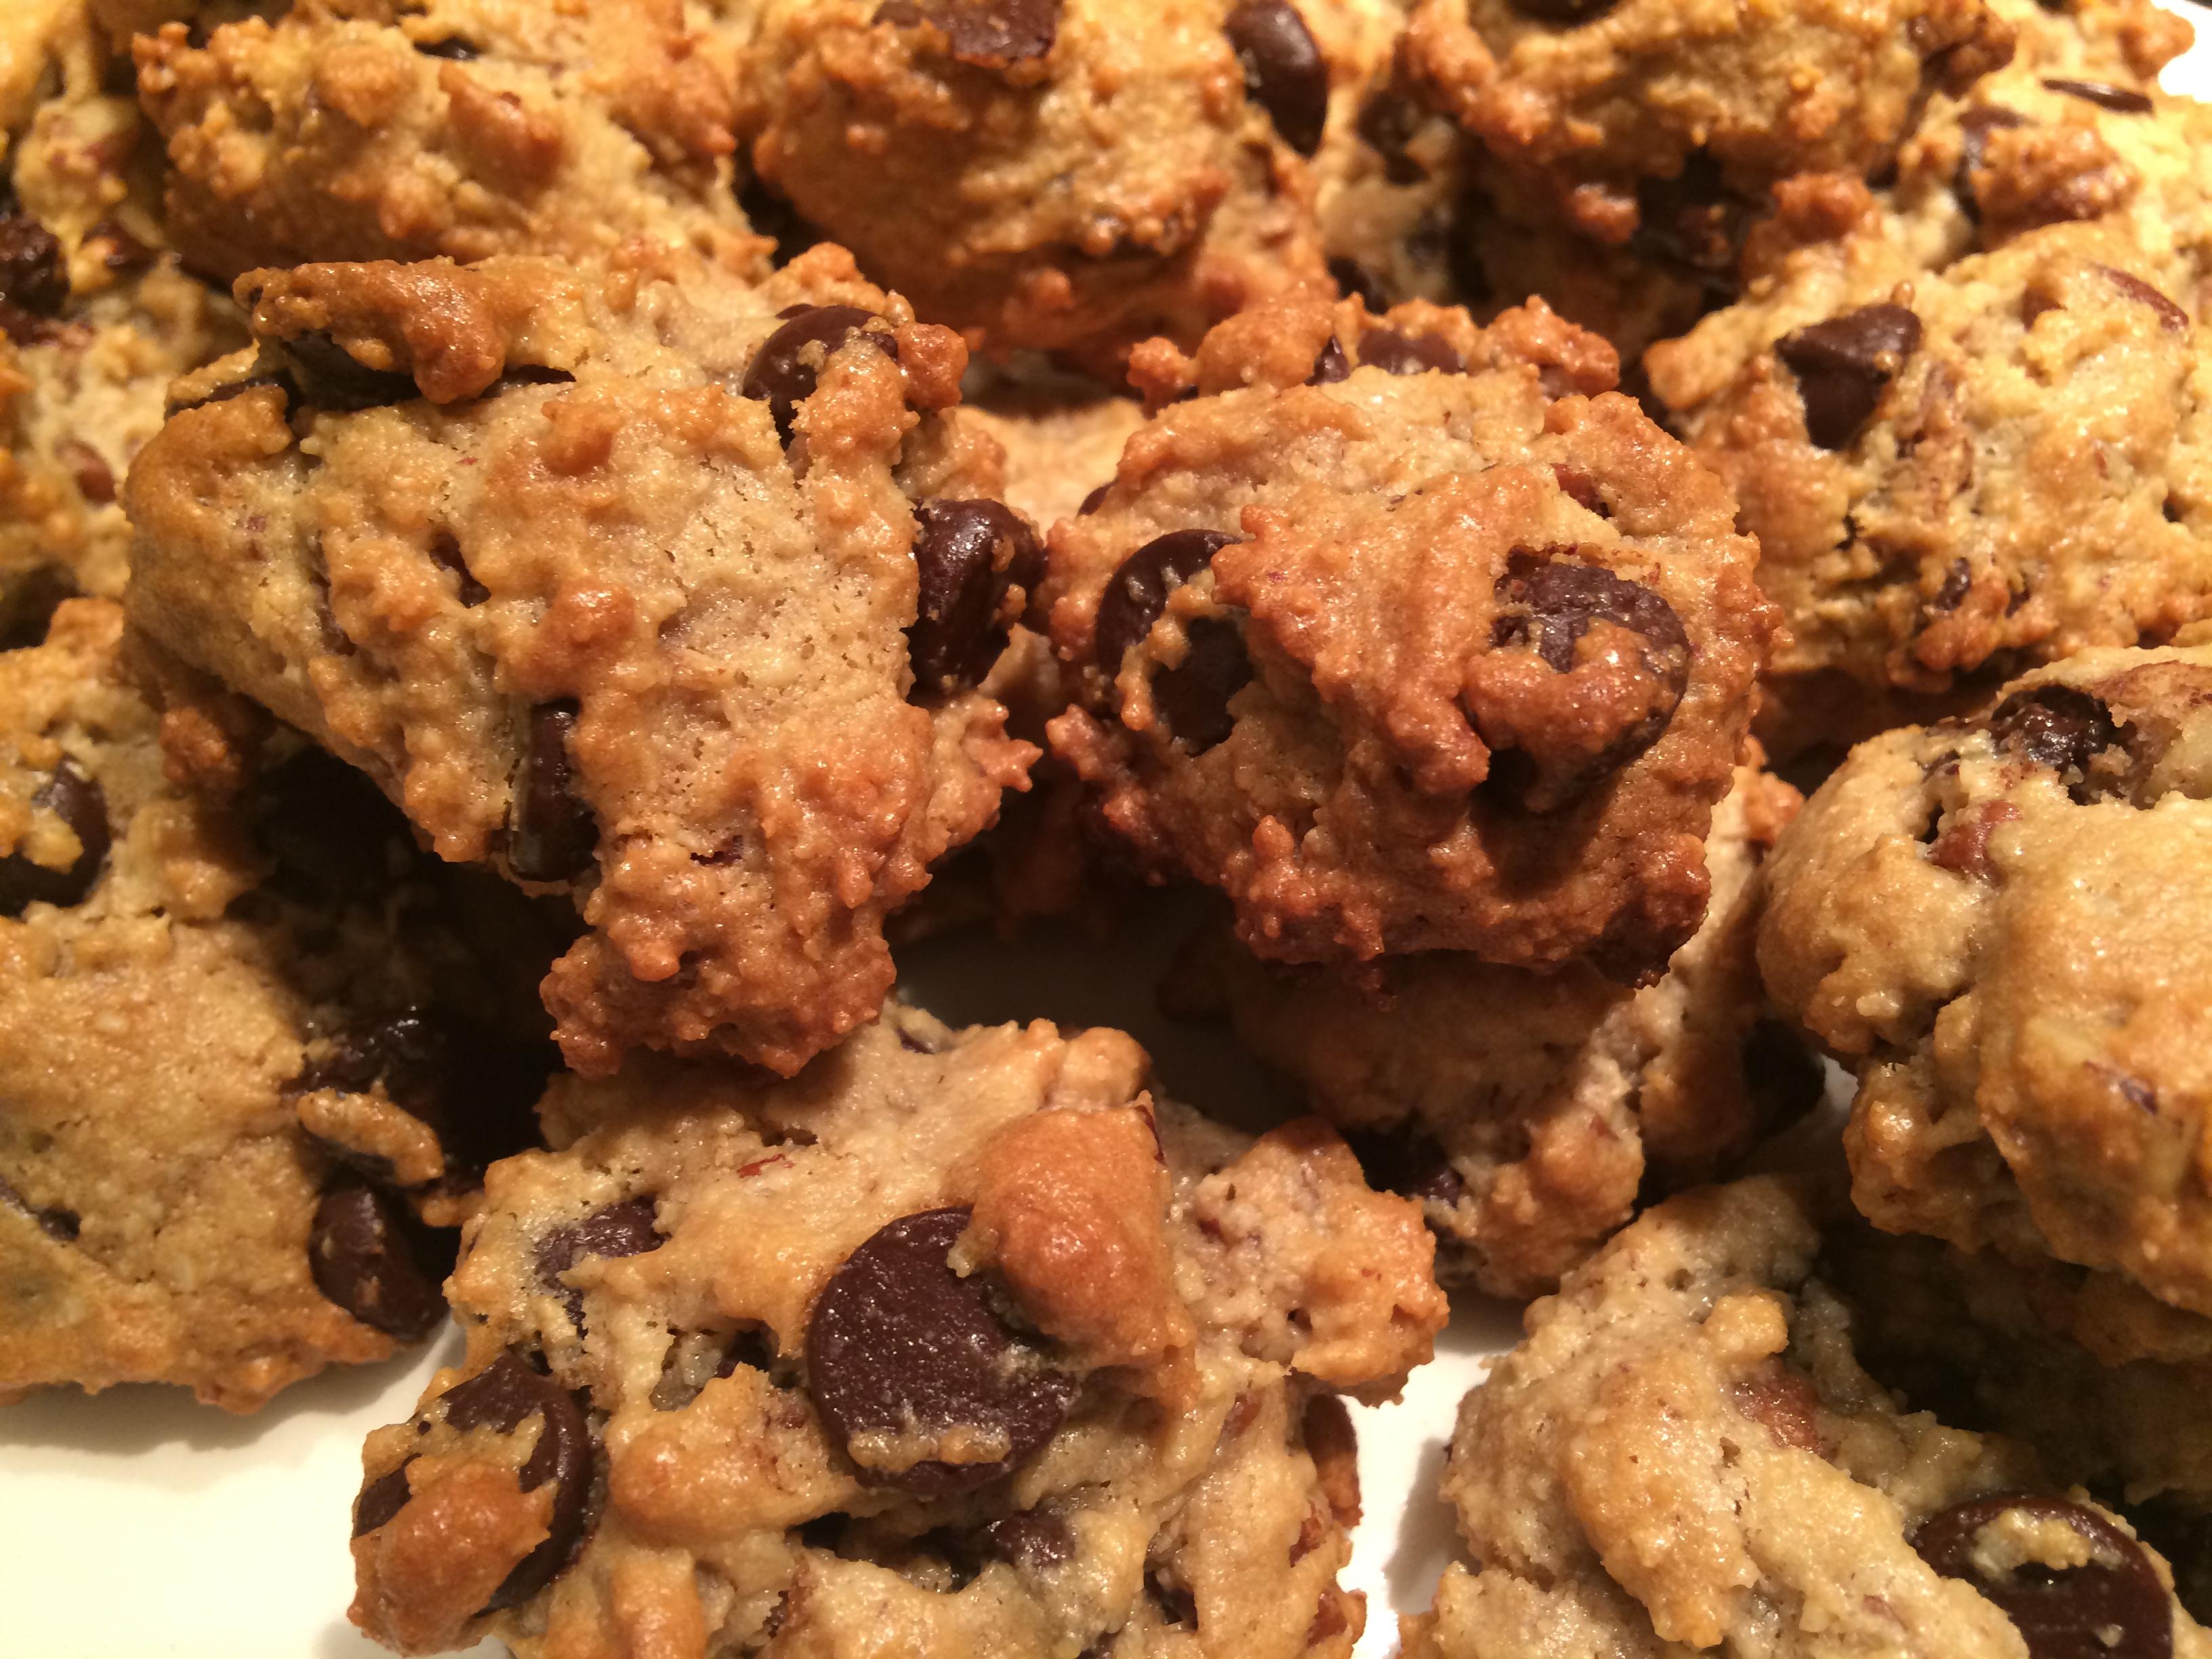 Chocolate Chip Cookies Go Wild